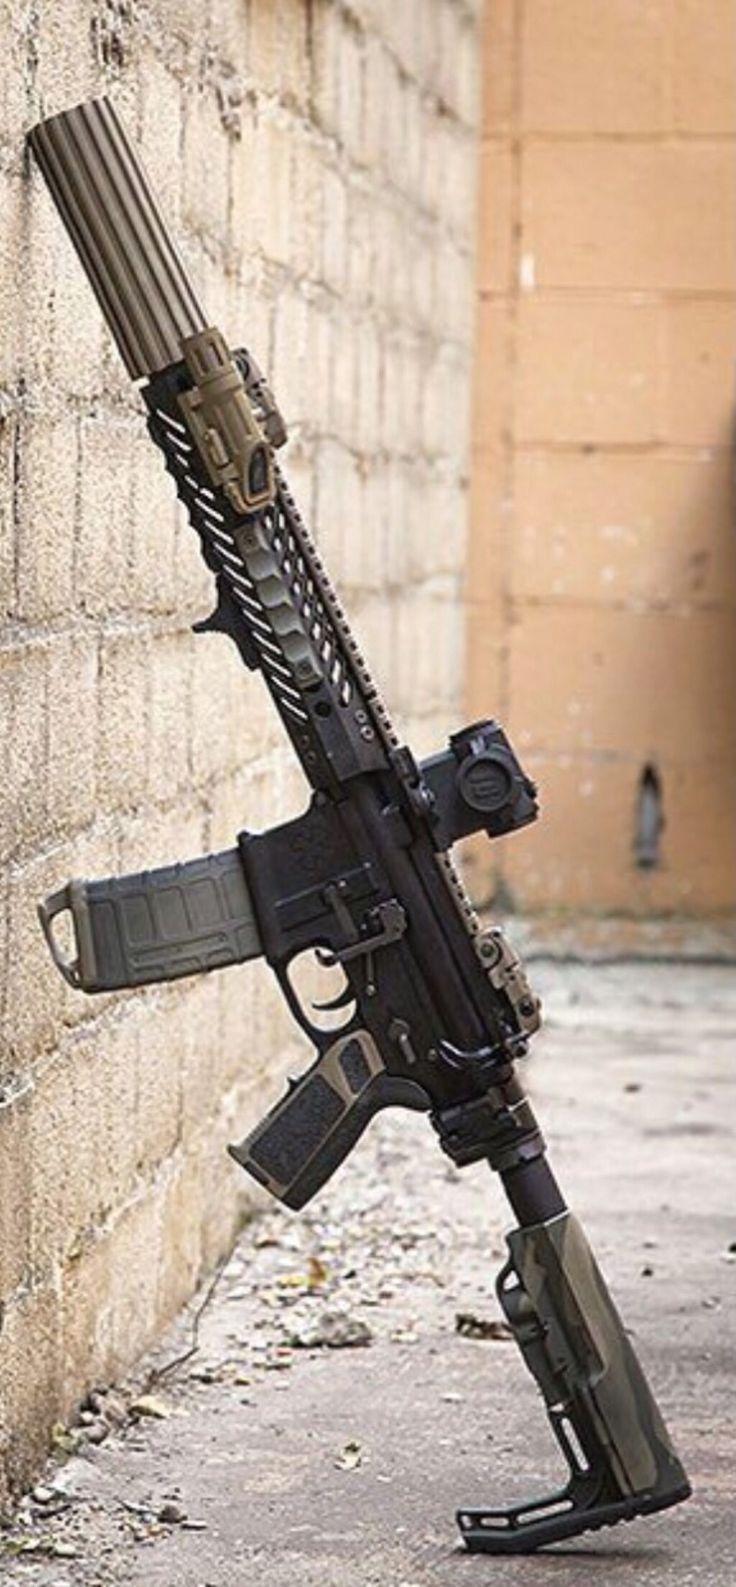 493 best images about My gun wish list on Pinterest